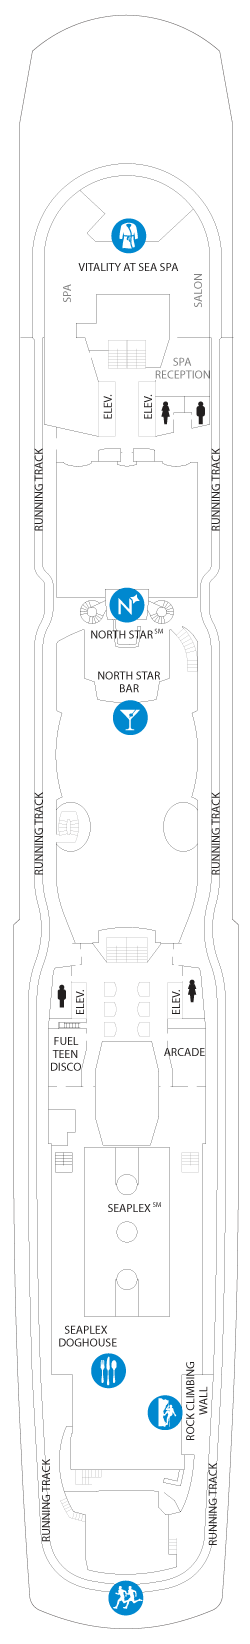 Ovation of the Seas Deck 15